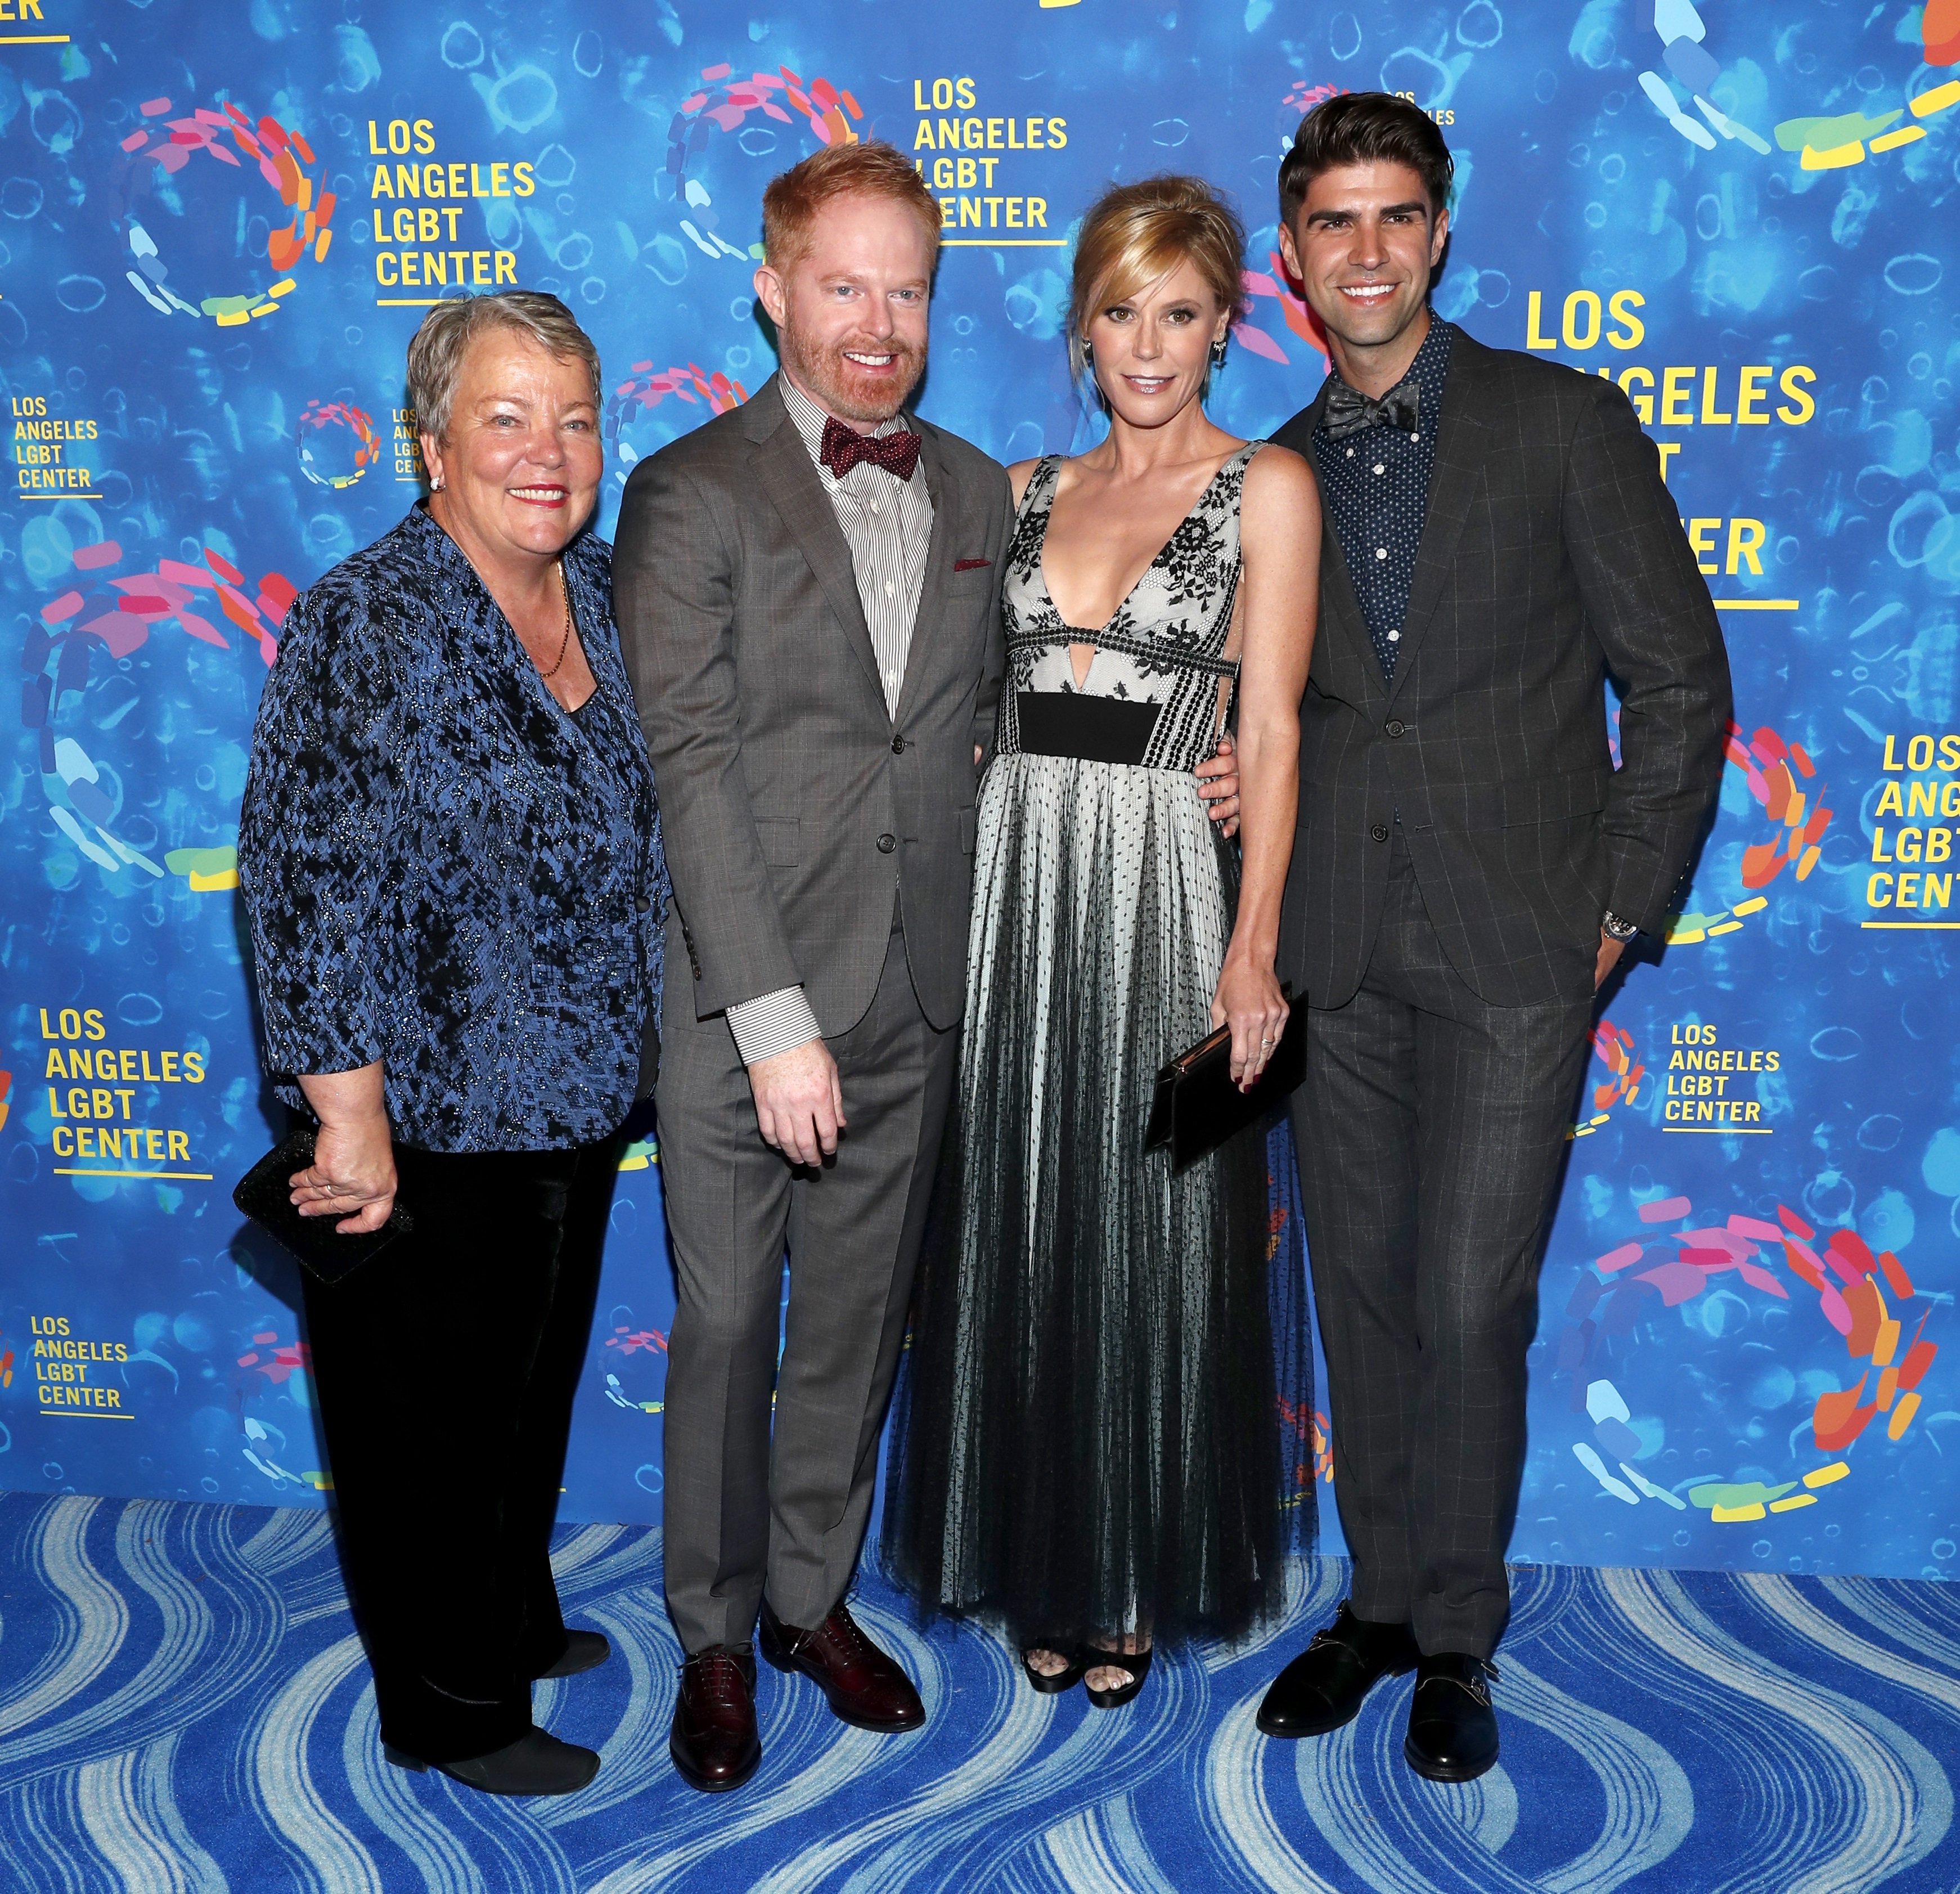 (I-D) Lorri L. Jean, los actores Jesse Tyler Ferguson y Julie Bowen, y Justin Mikita